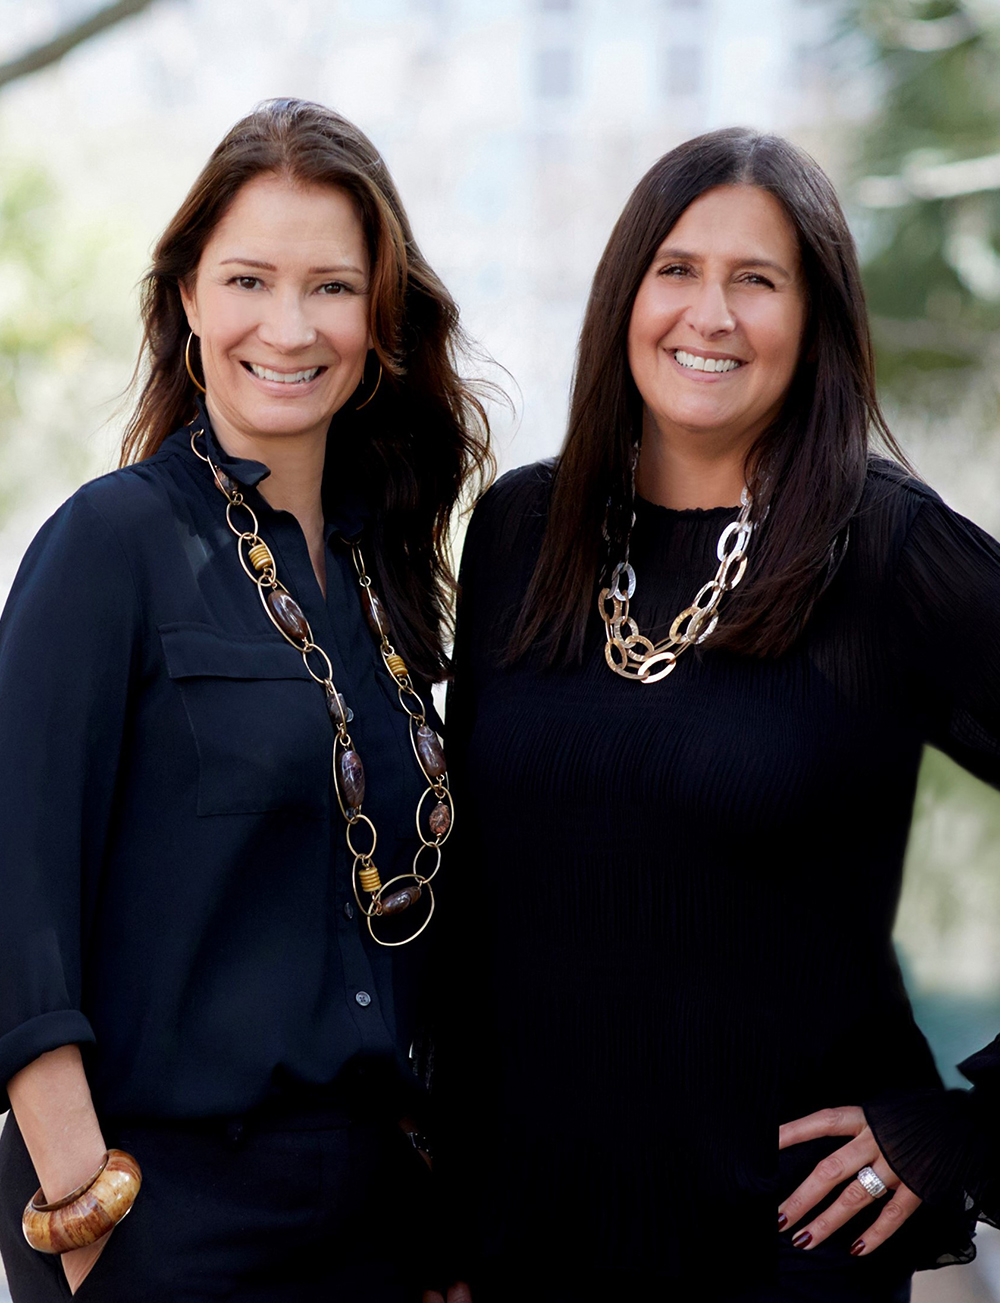 Joy Dellapina and Kathleen McCormack